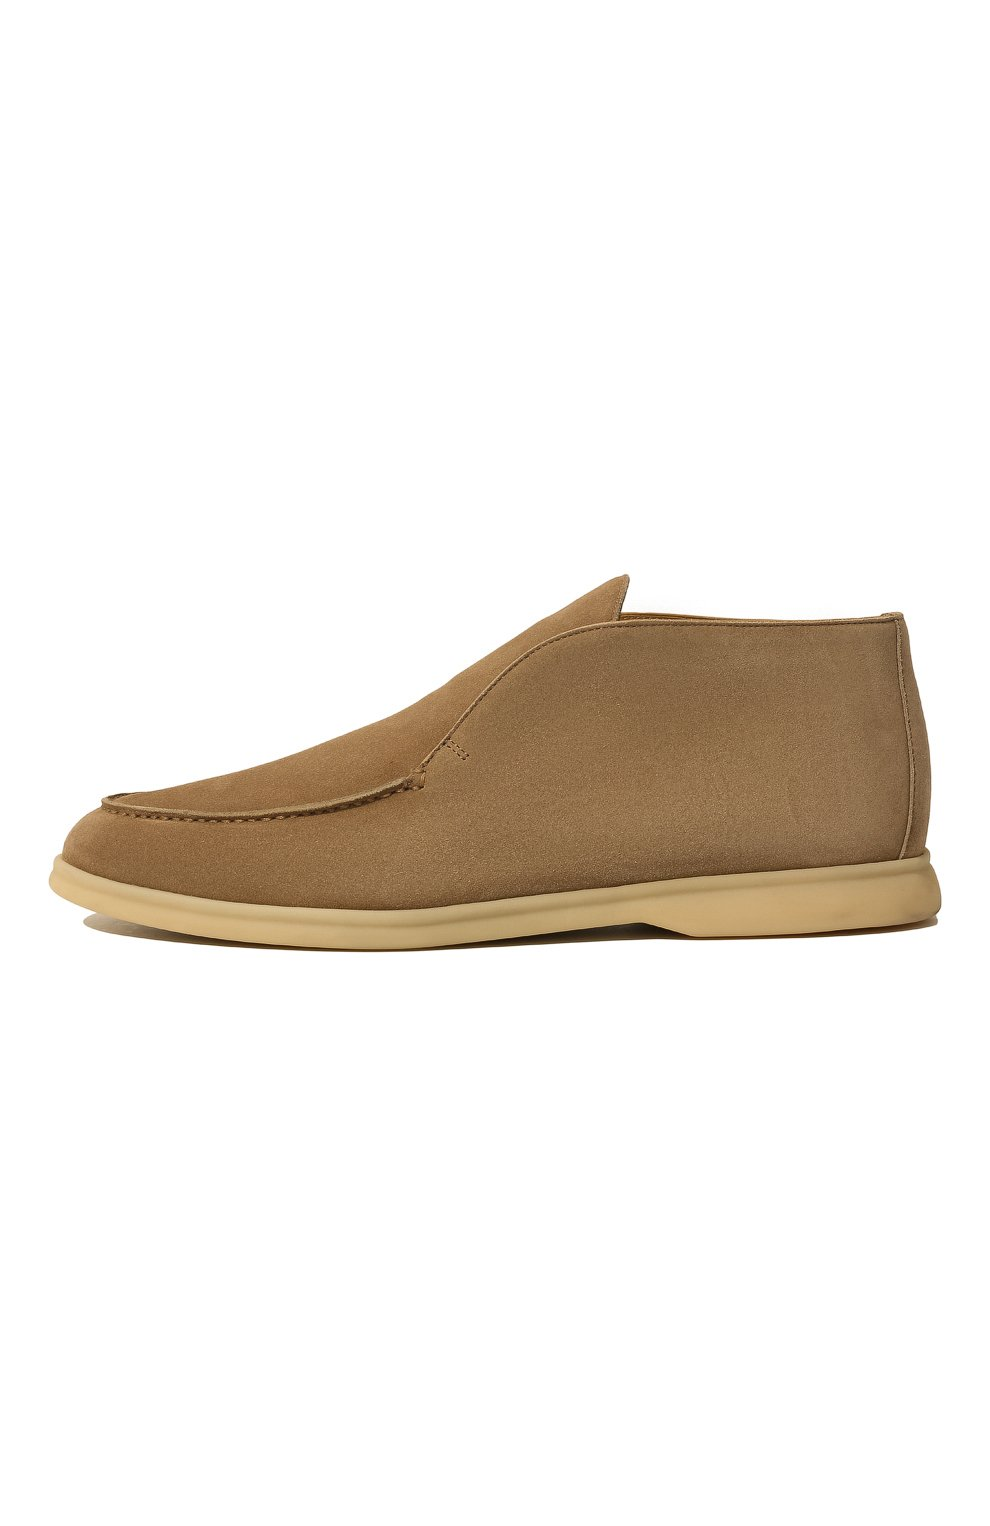 Мужские замшевые ботинки open walk LORO PIANA бежевого цвета, арт. FAB4368 | Фото 4